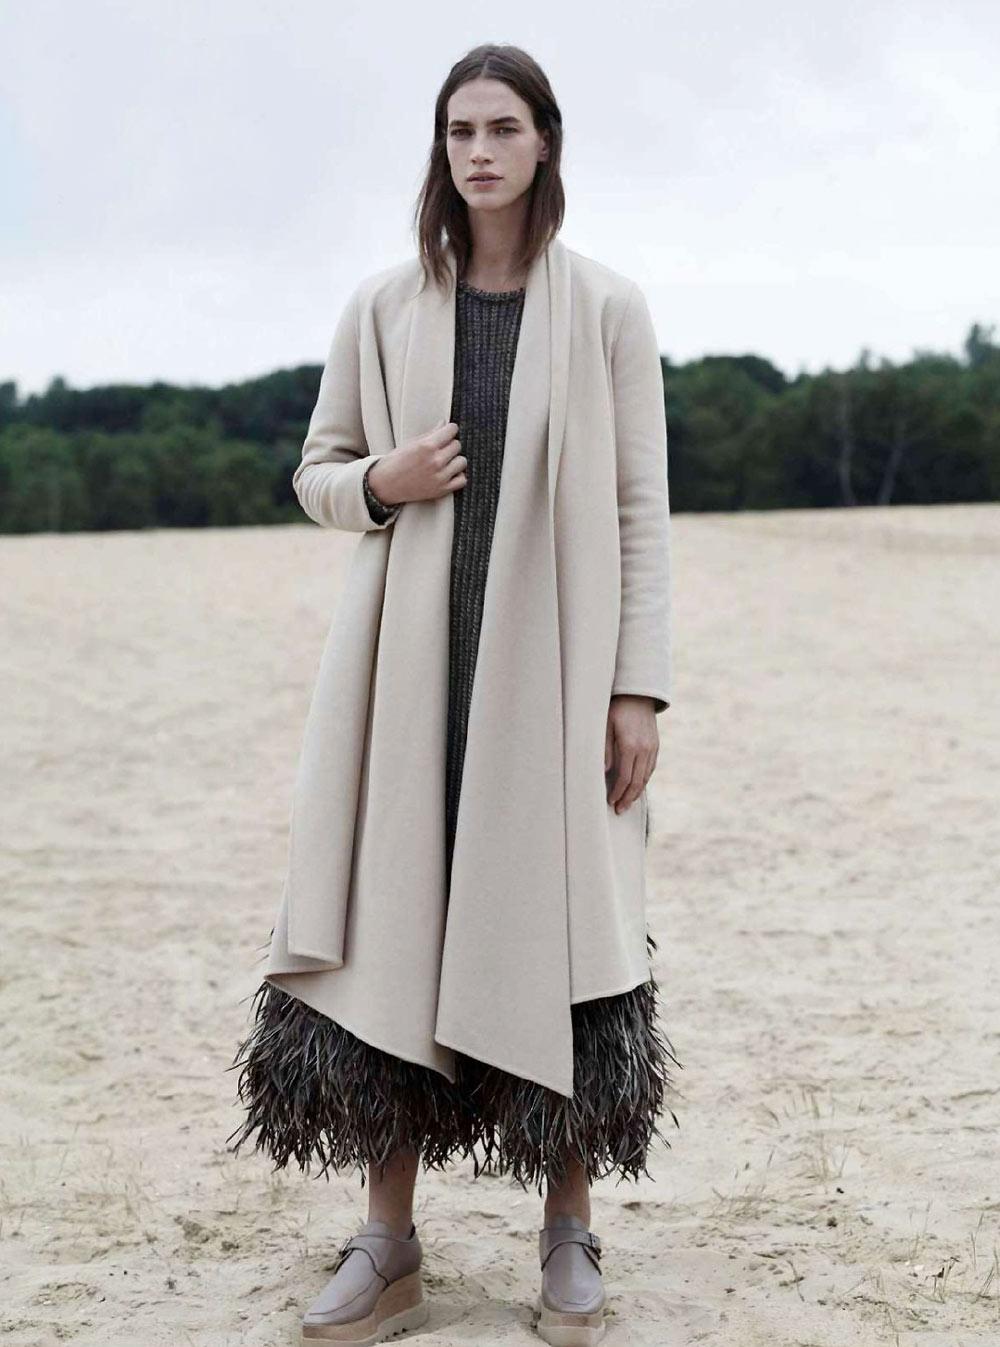 Crista, Cober, Laurence, Ellis, L'Officiel, Editorial, October, 2014, Fashion, Editorial, Oracle, Fox